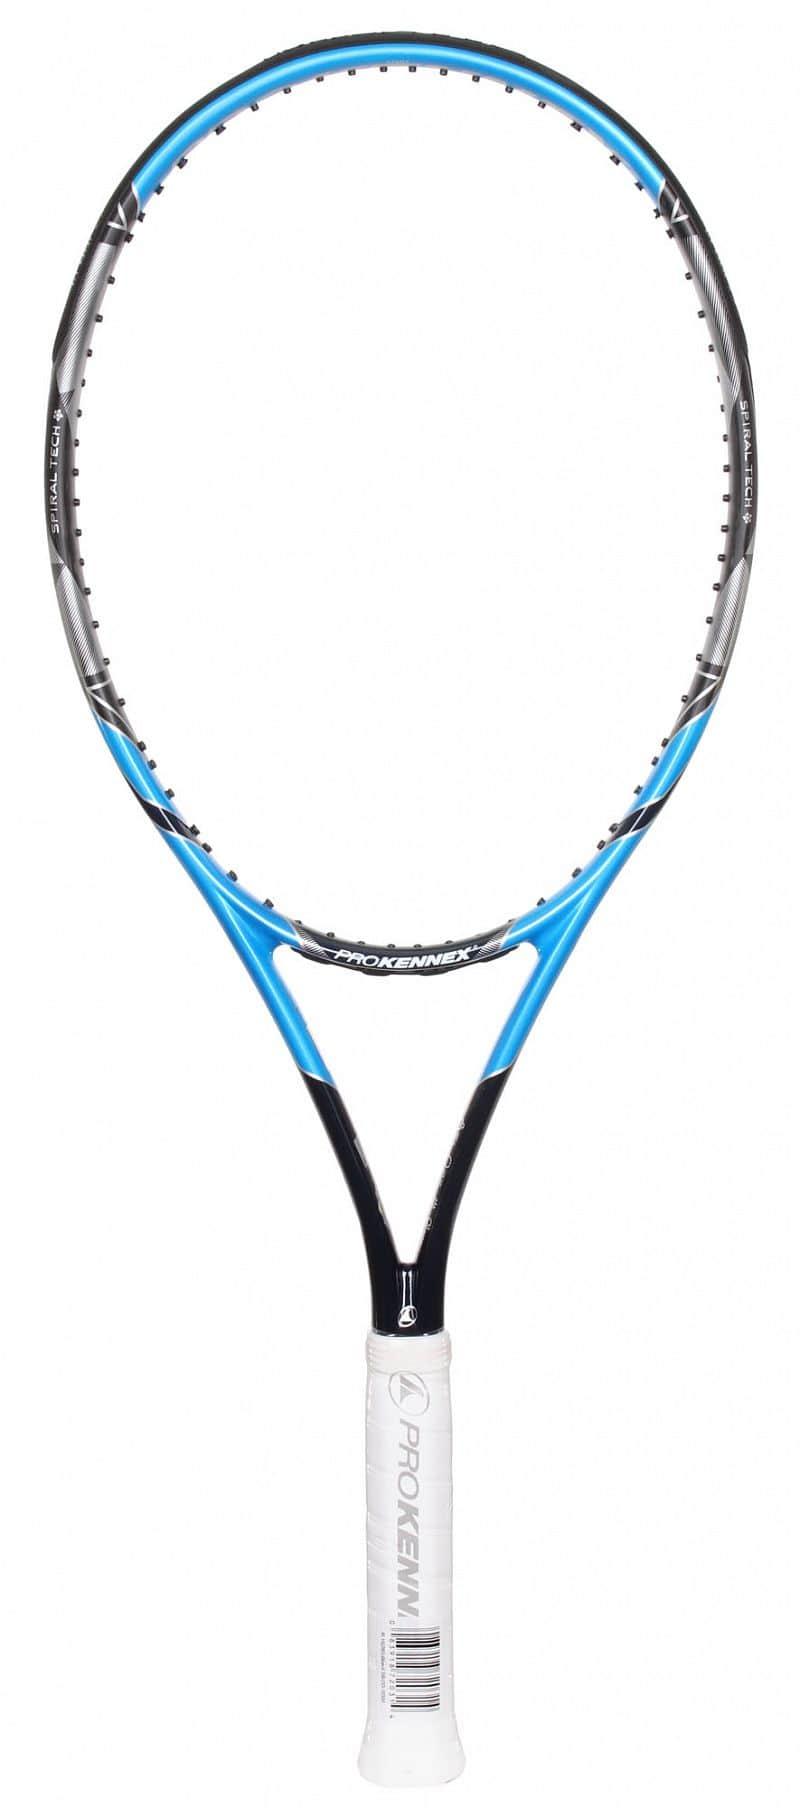 Kinetic Ki 15 2017 tenisová raketa grip: G3